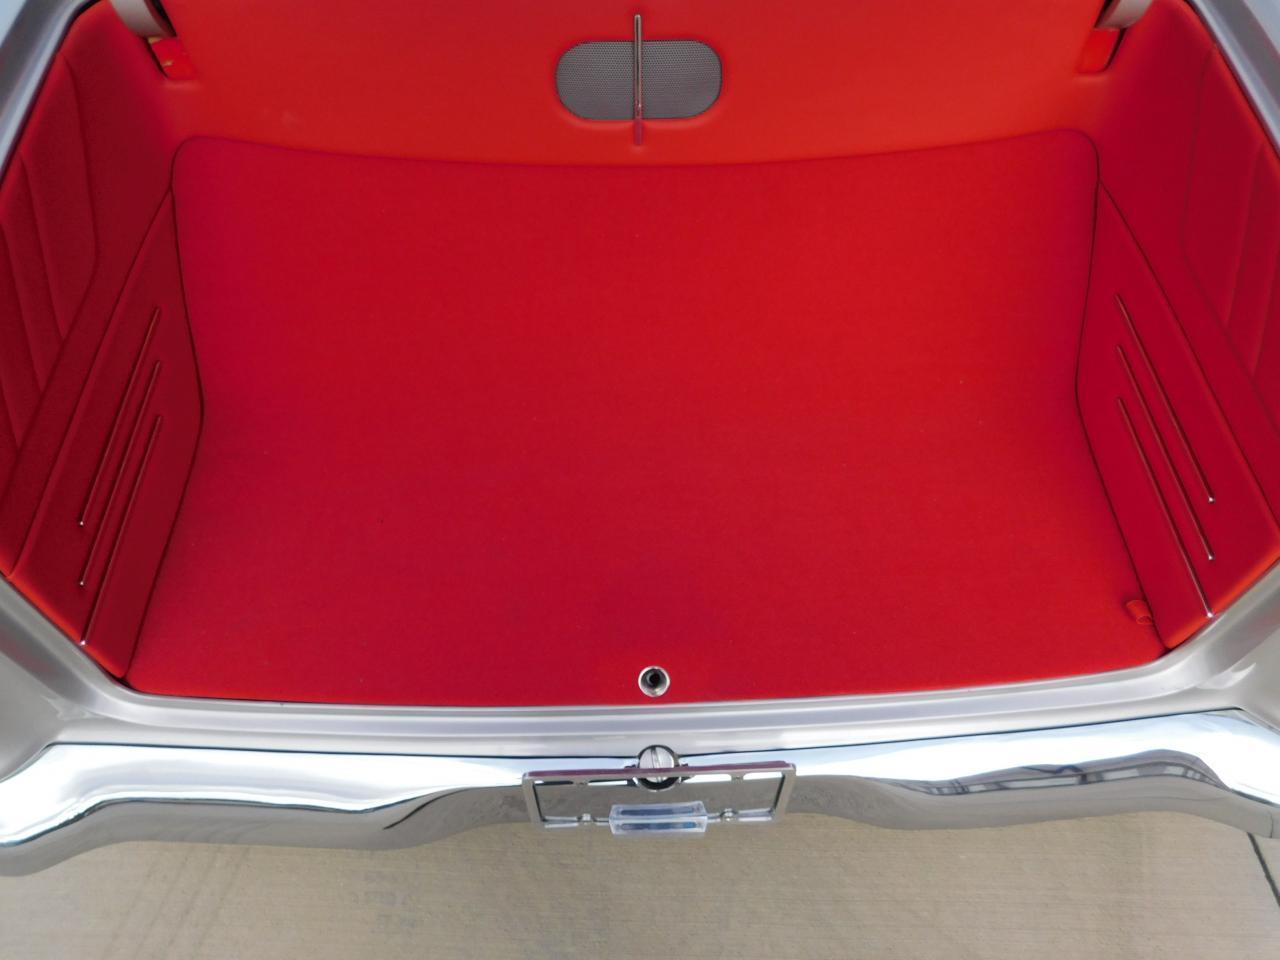 Large Picture of Classic '55 Chevrolet Bel Air located in Alpharetta Georgia - $199,000.00 Offered by Gateway Classic Cars - Atlanta - MDI3